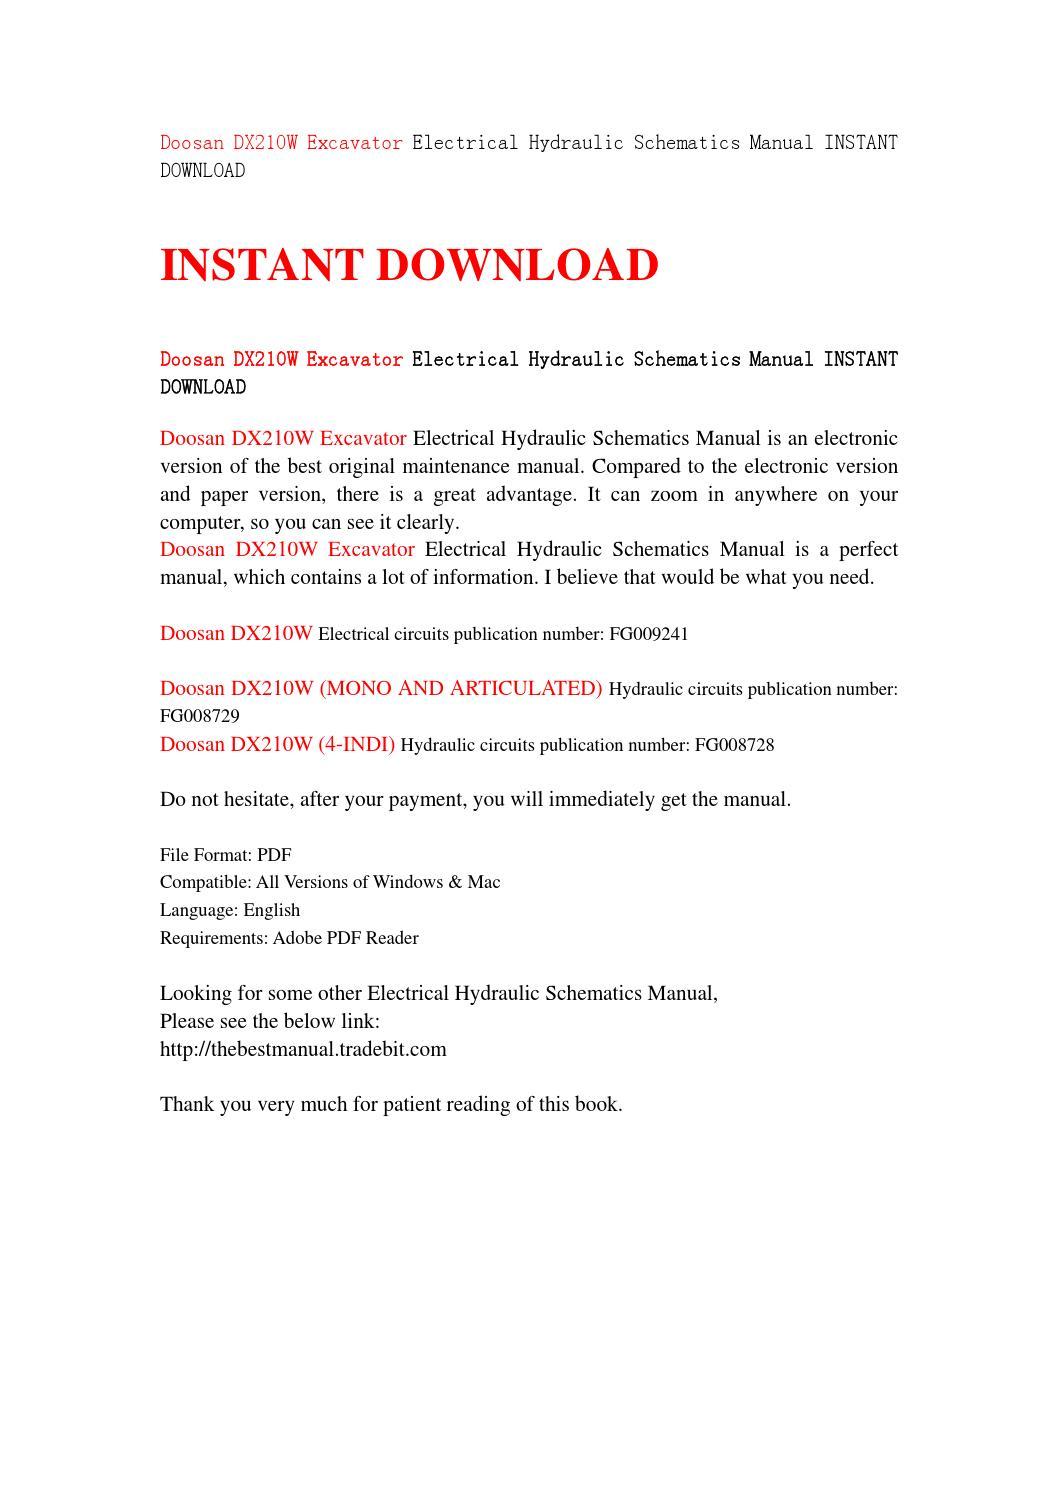 Doosan dx210w excavator electrical hydraulic schematics manual instant  download by sjefhsnen - issuu